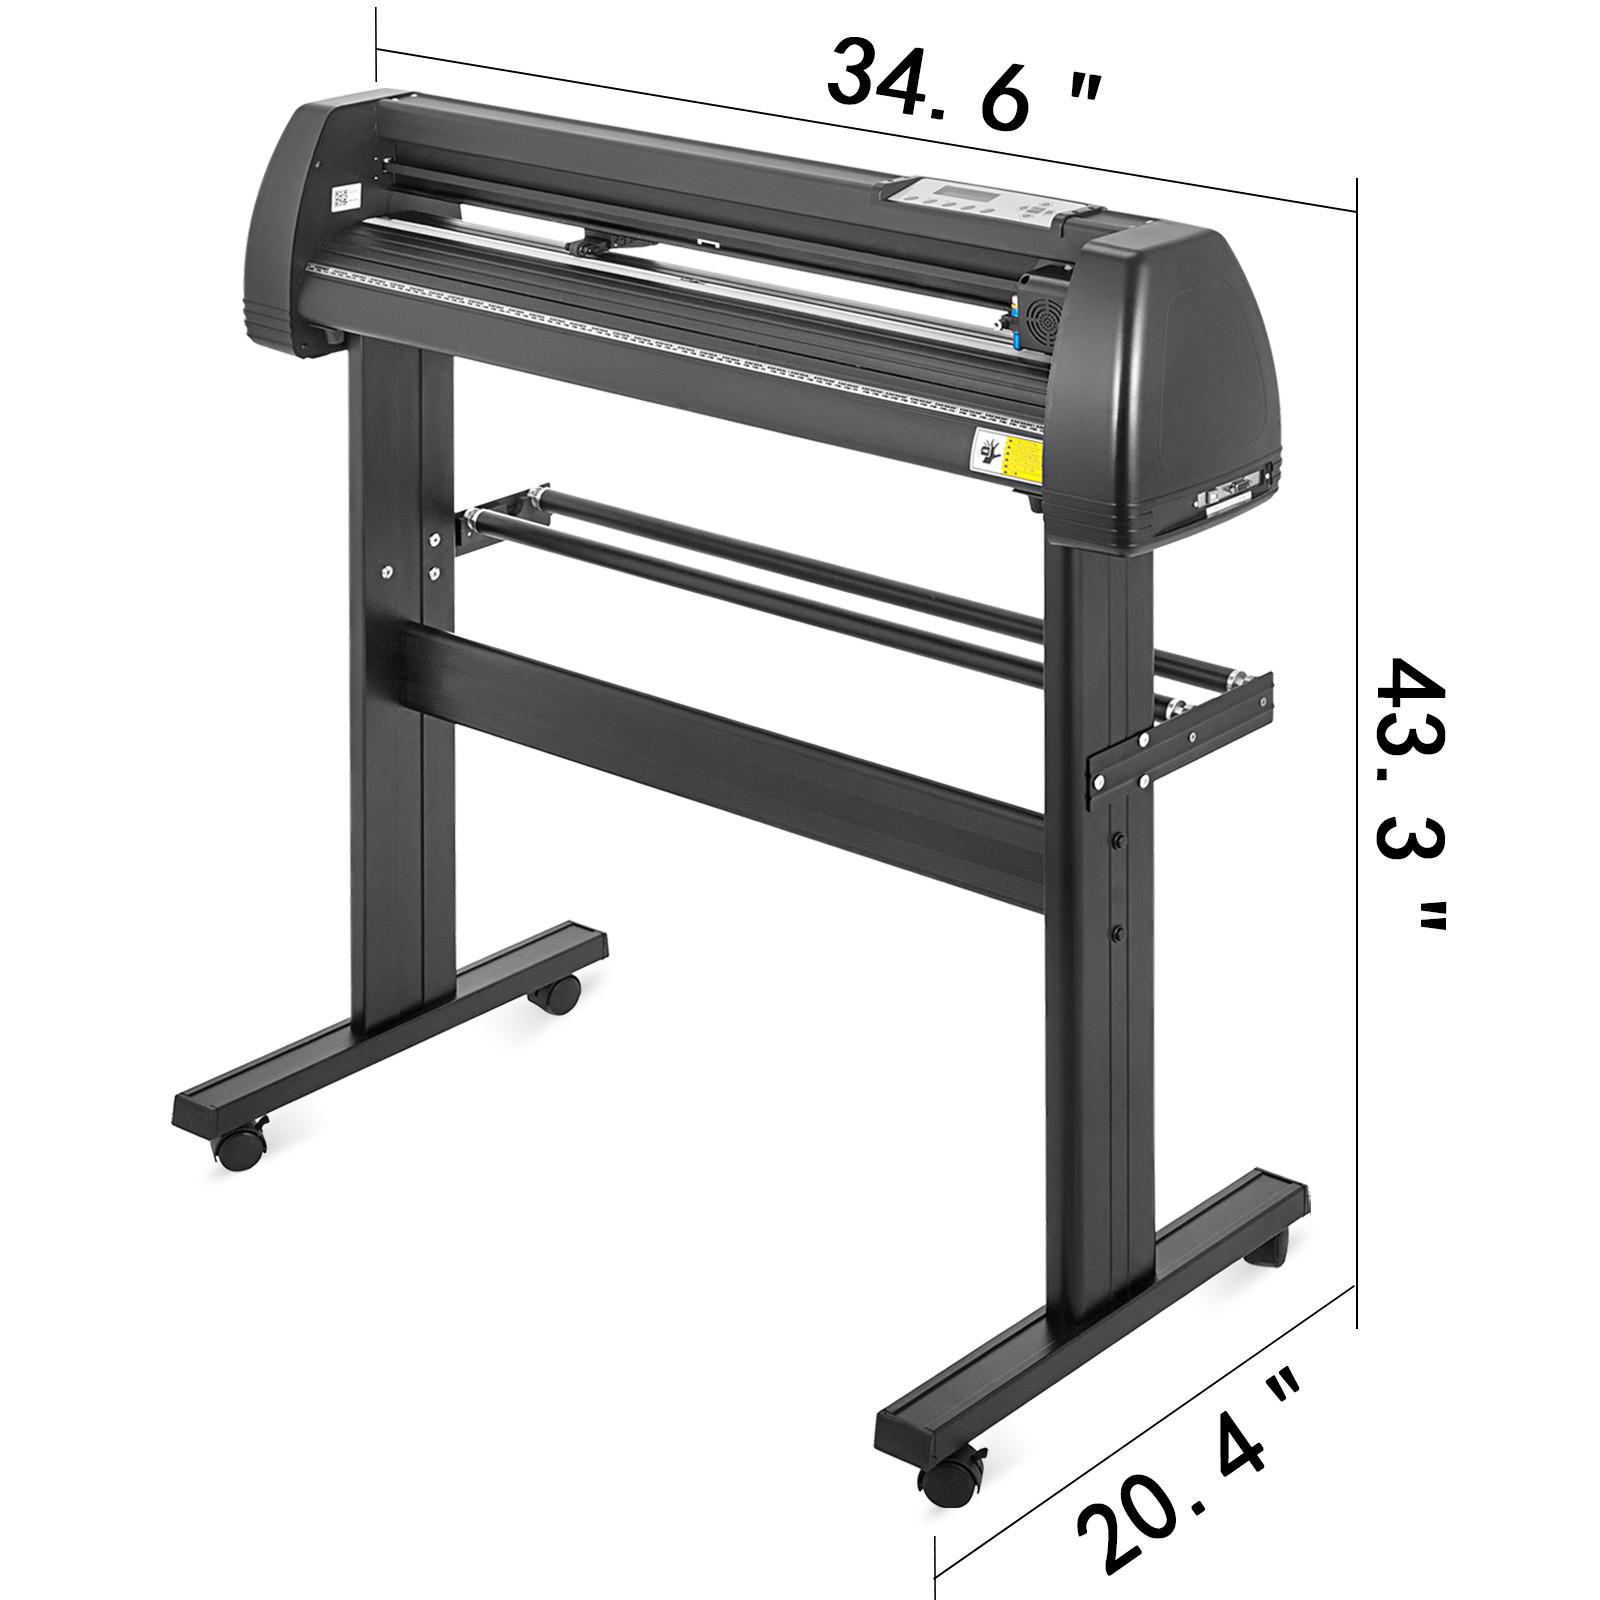 Vinyl Cutter Plotter Cutting 14283453 inch 3 Blades WTable Signmaster  eBay